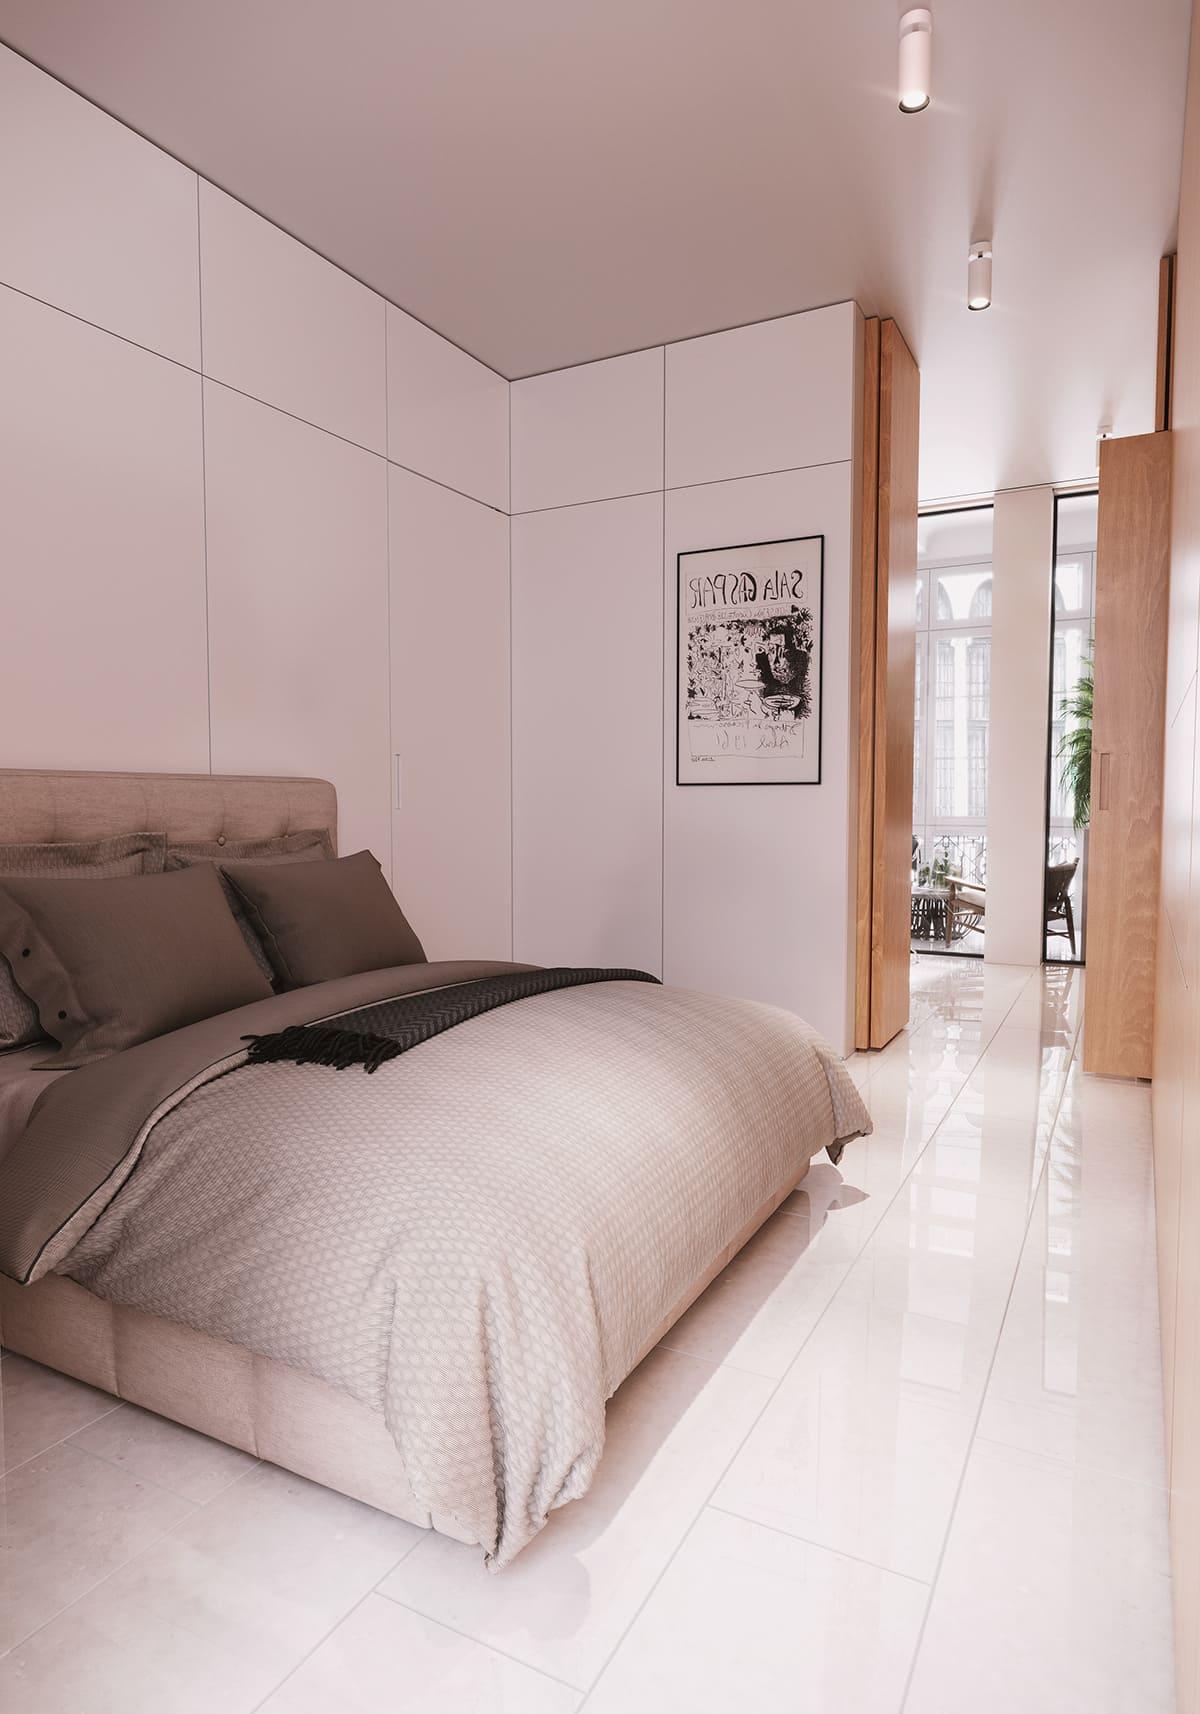 дизайн интерьера модной квартиры фото 13